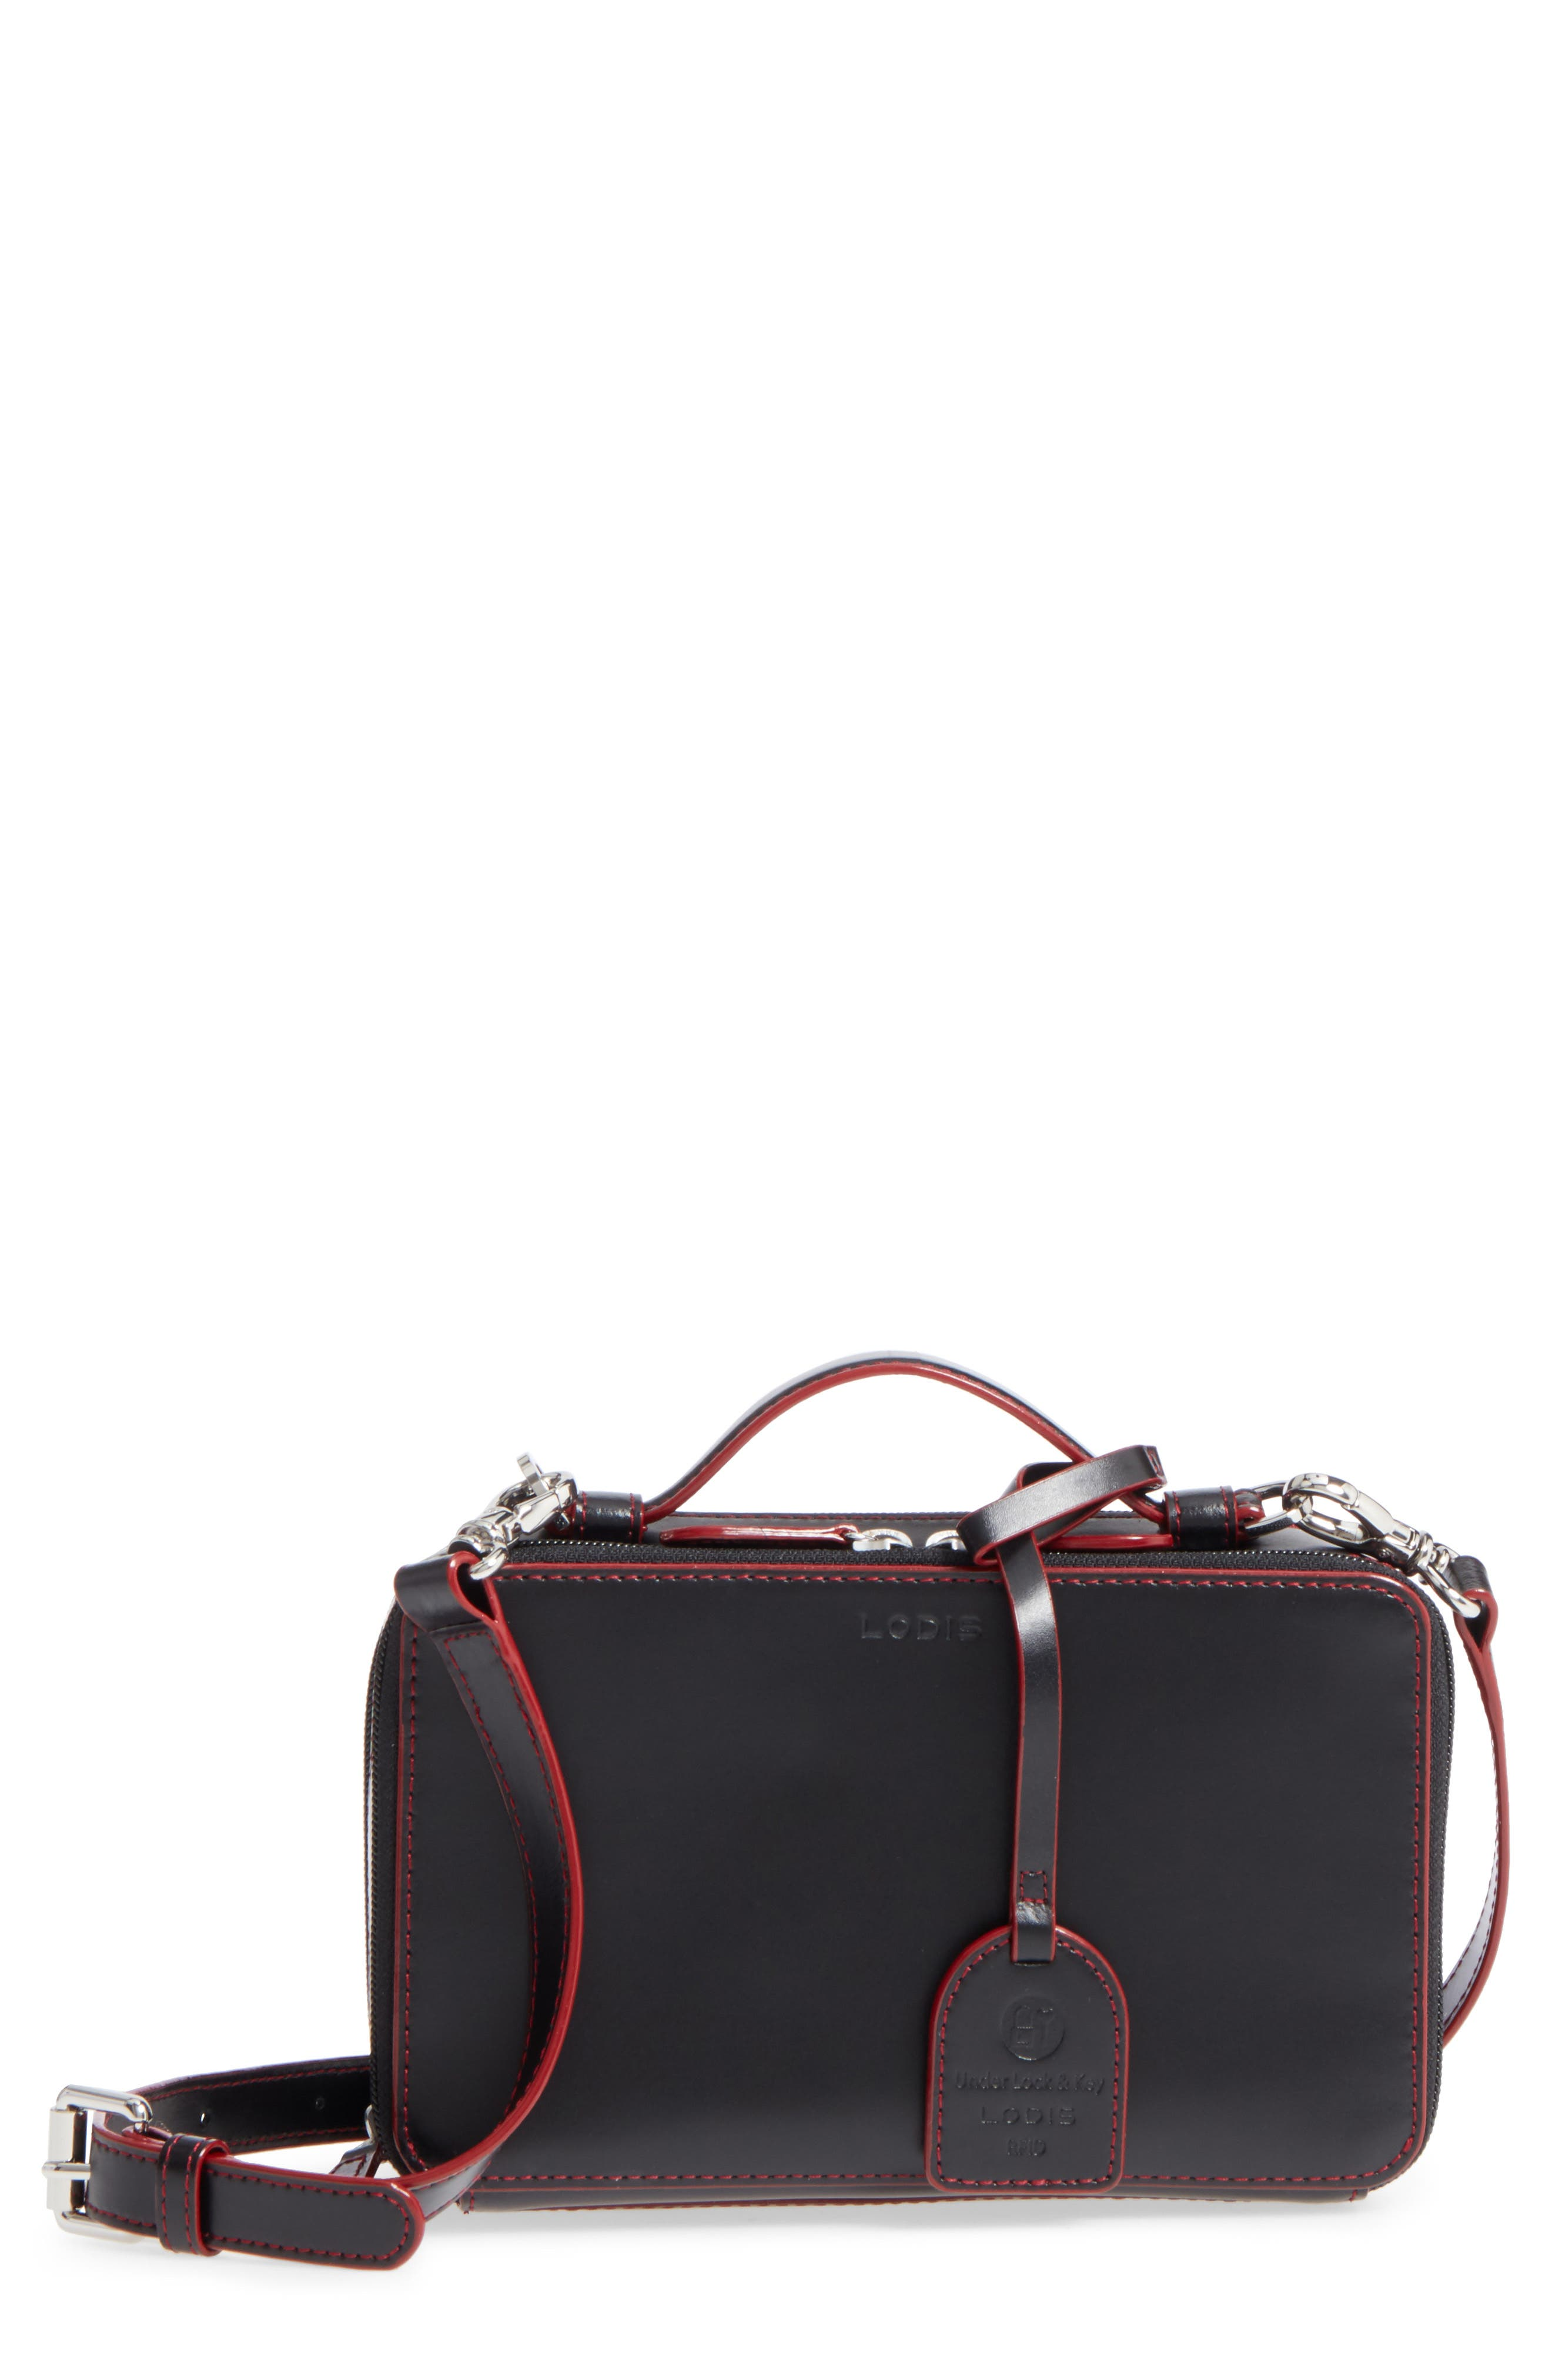 LODIS Los Angeles Downtown Sally RFID Zip-Around Leather Crossbody Bag